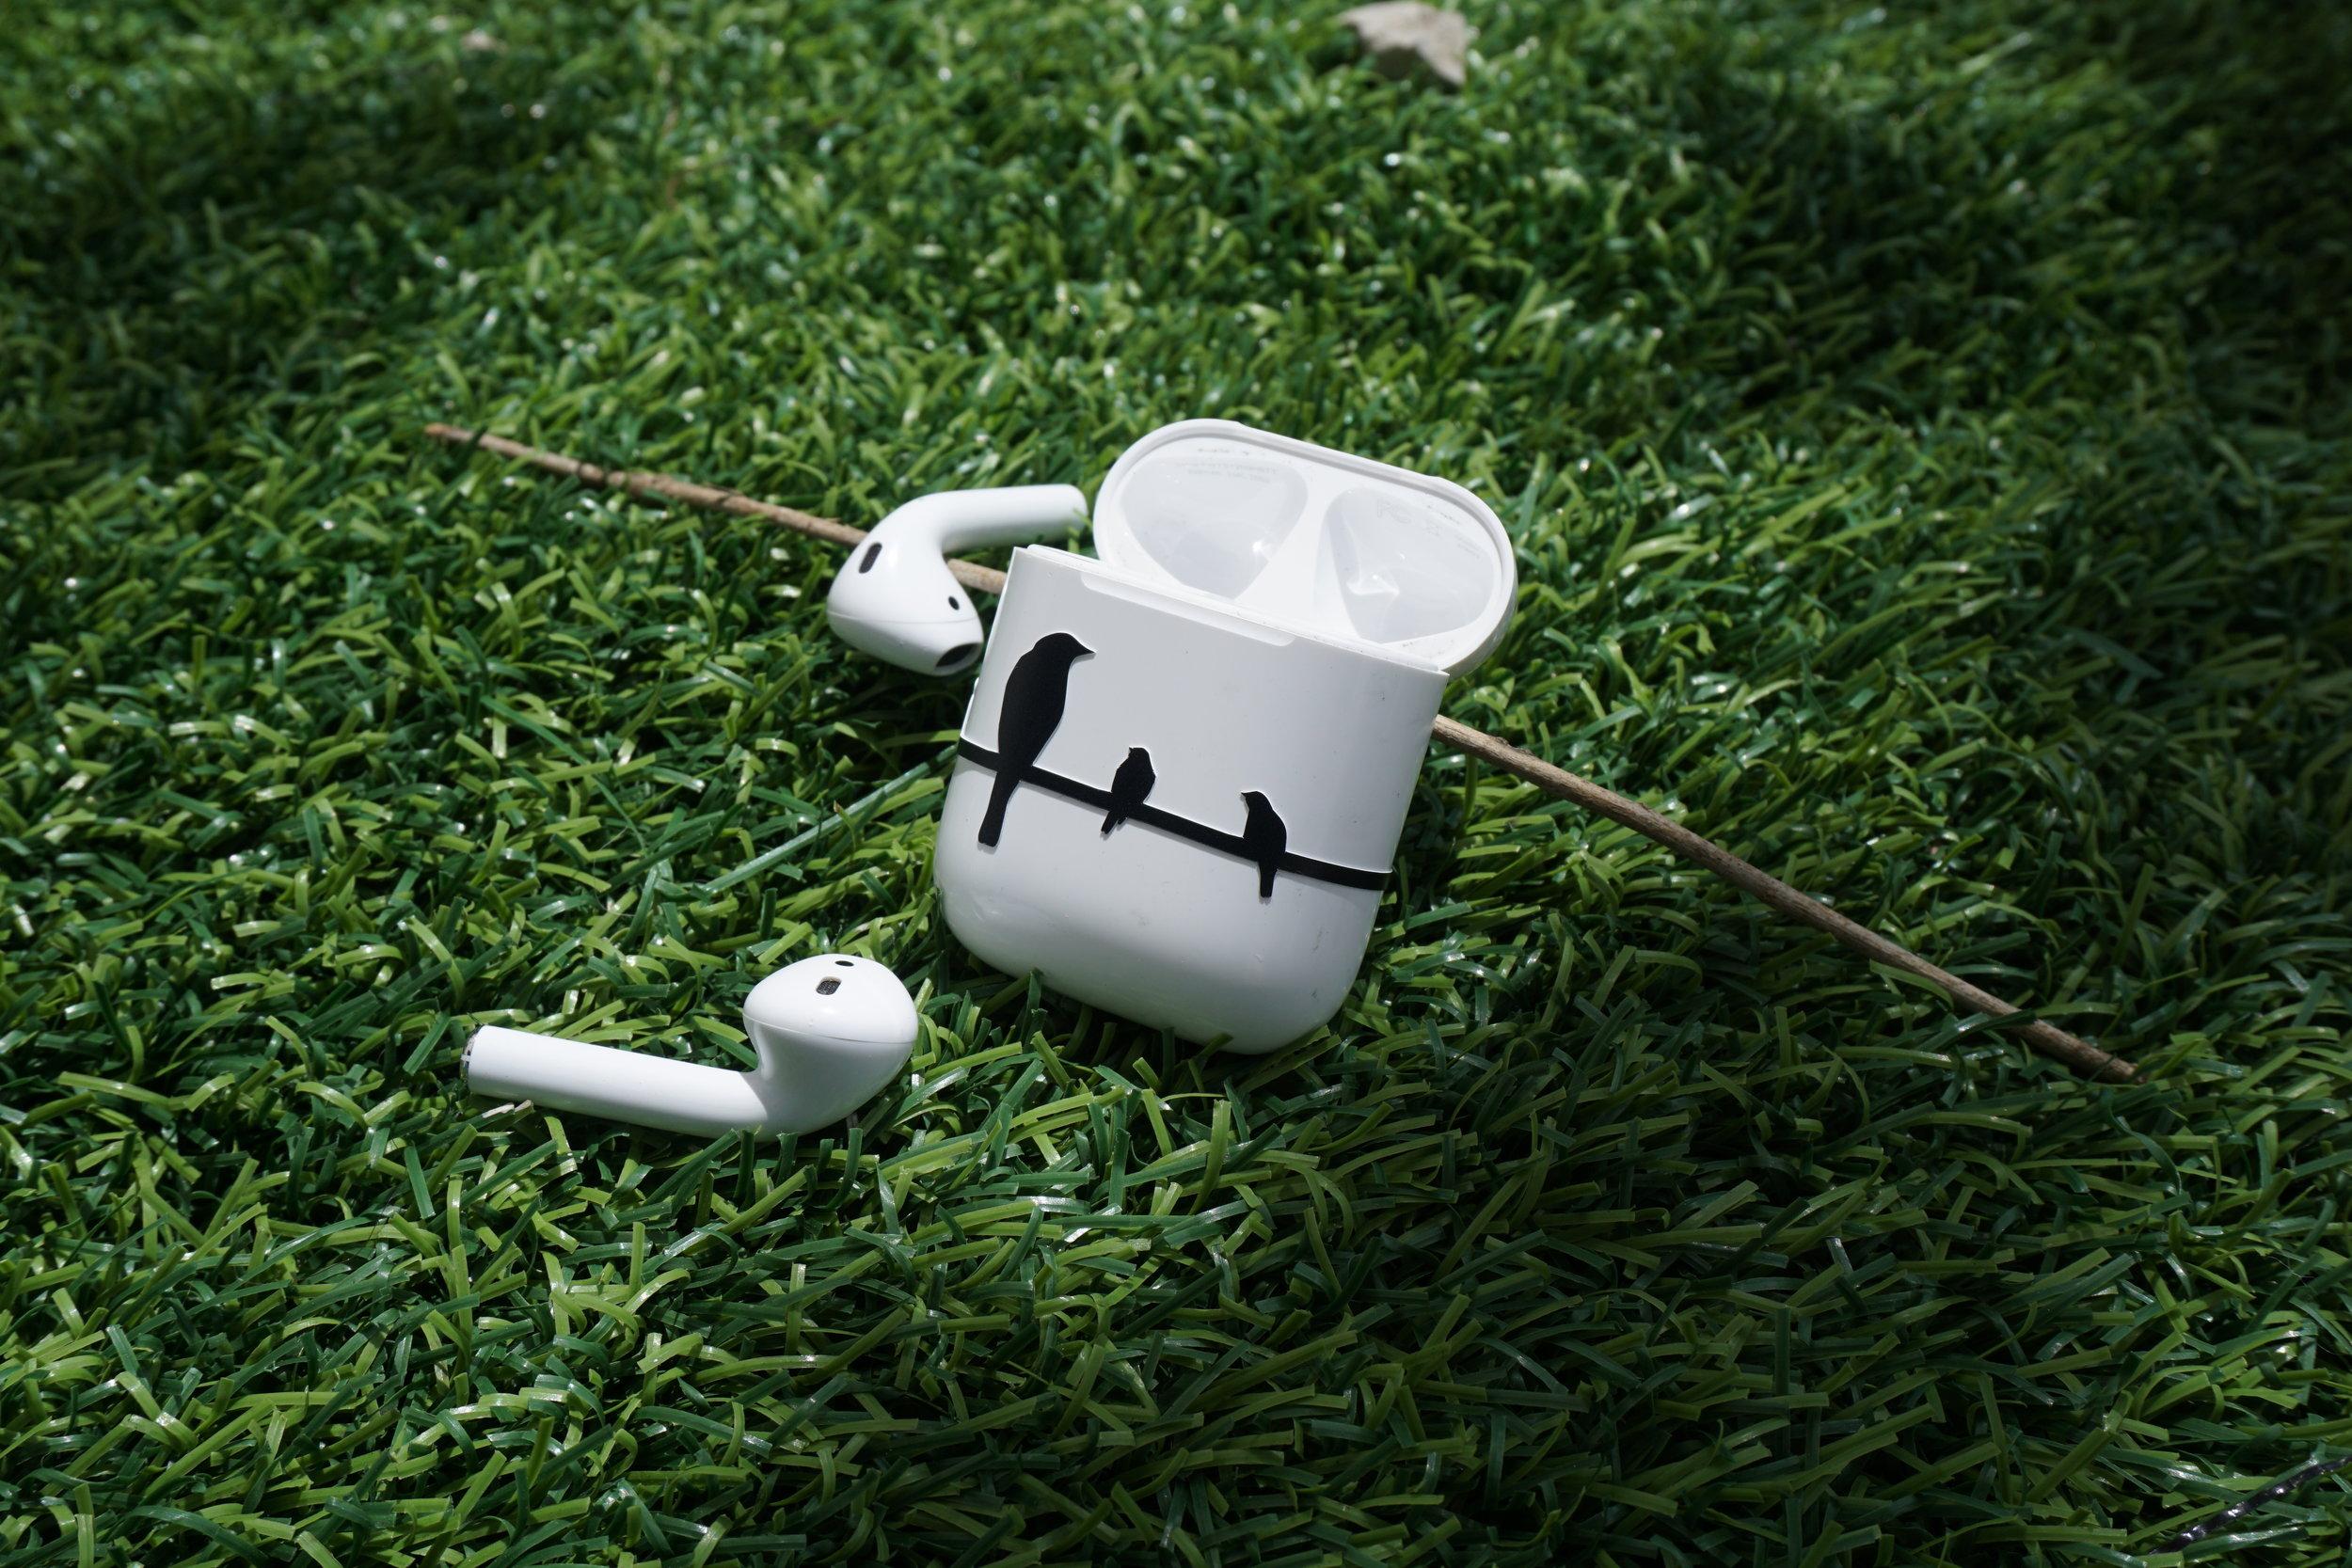 apple-airpod-decal-case-vinyl